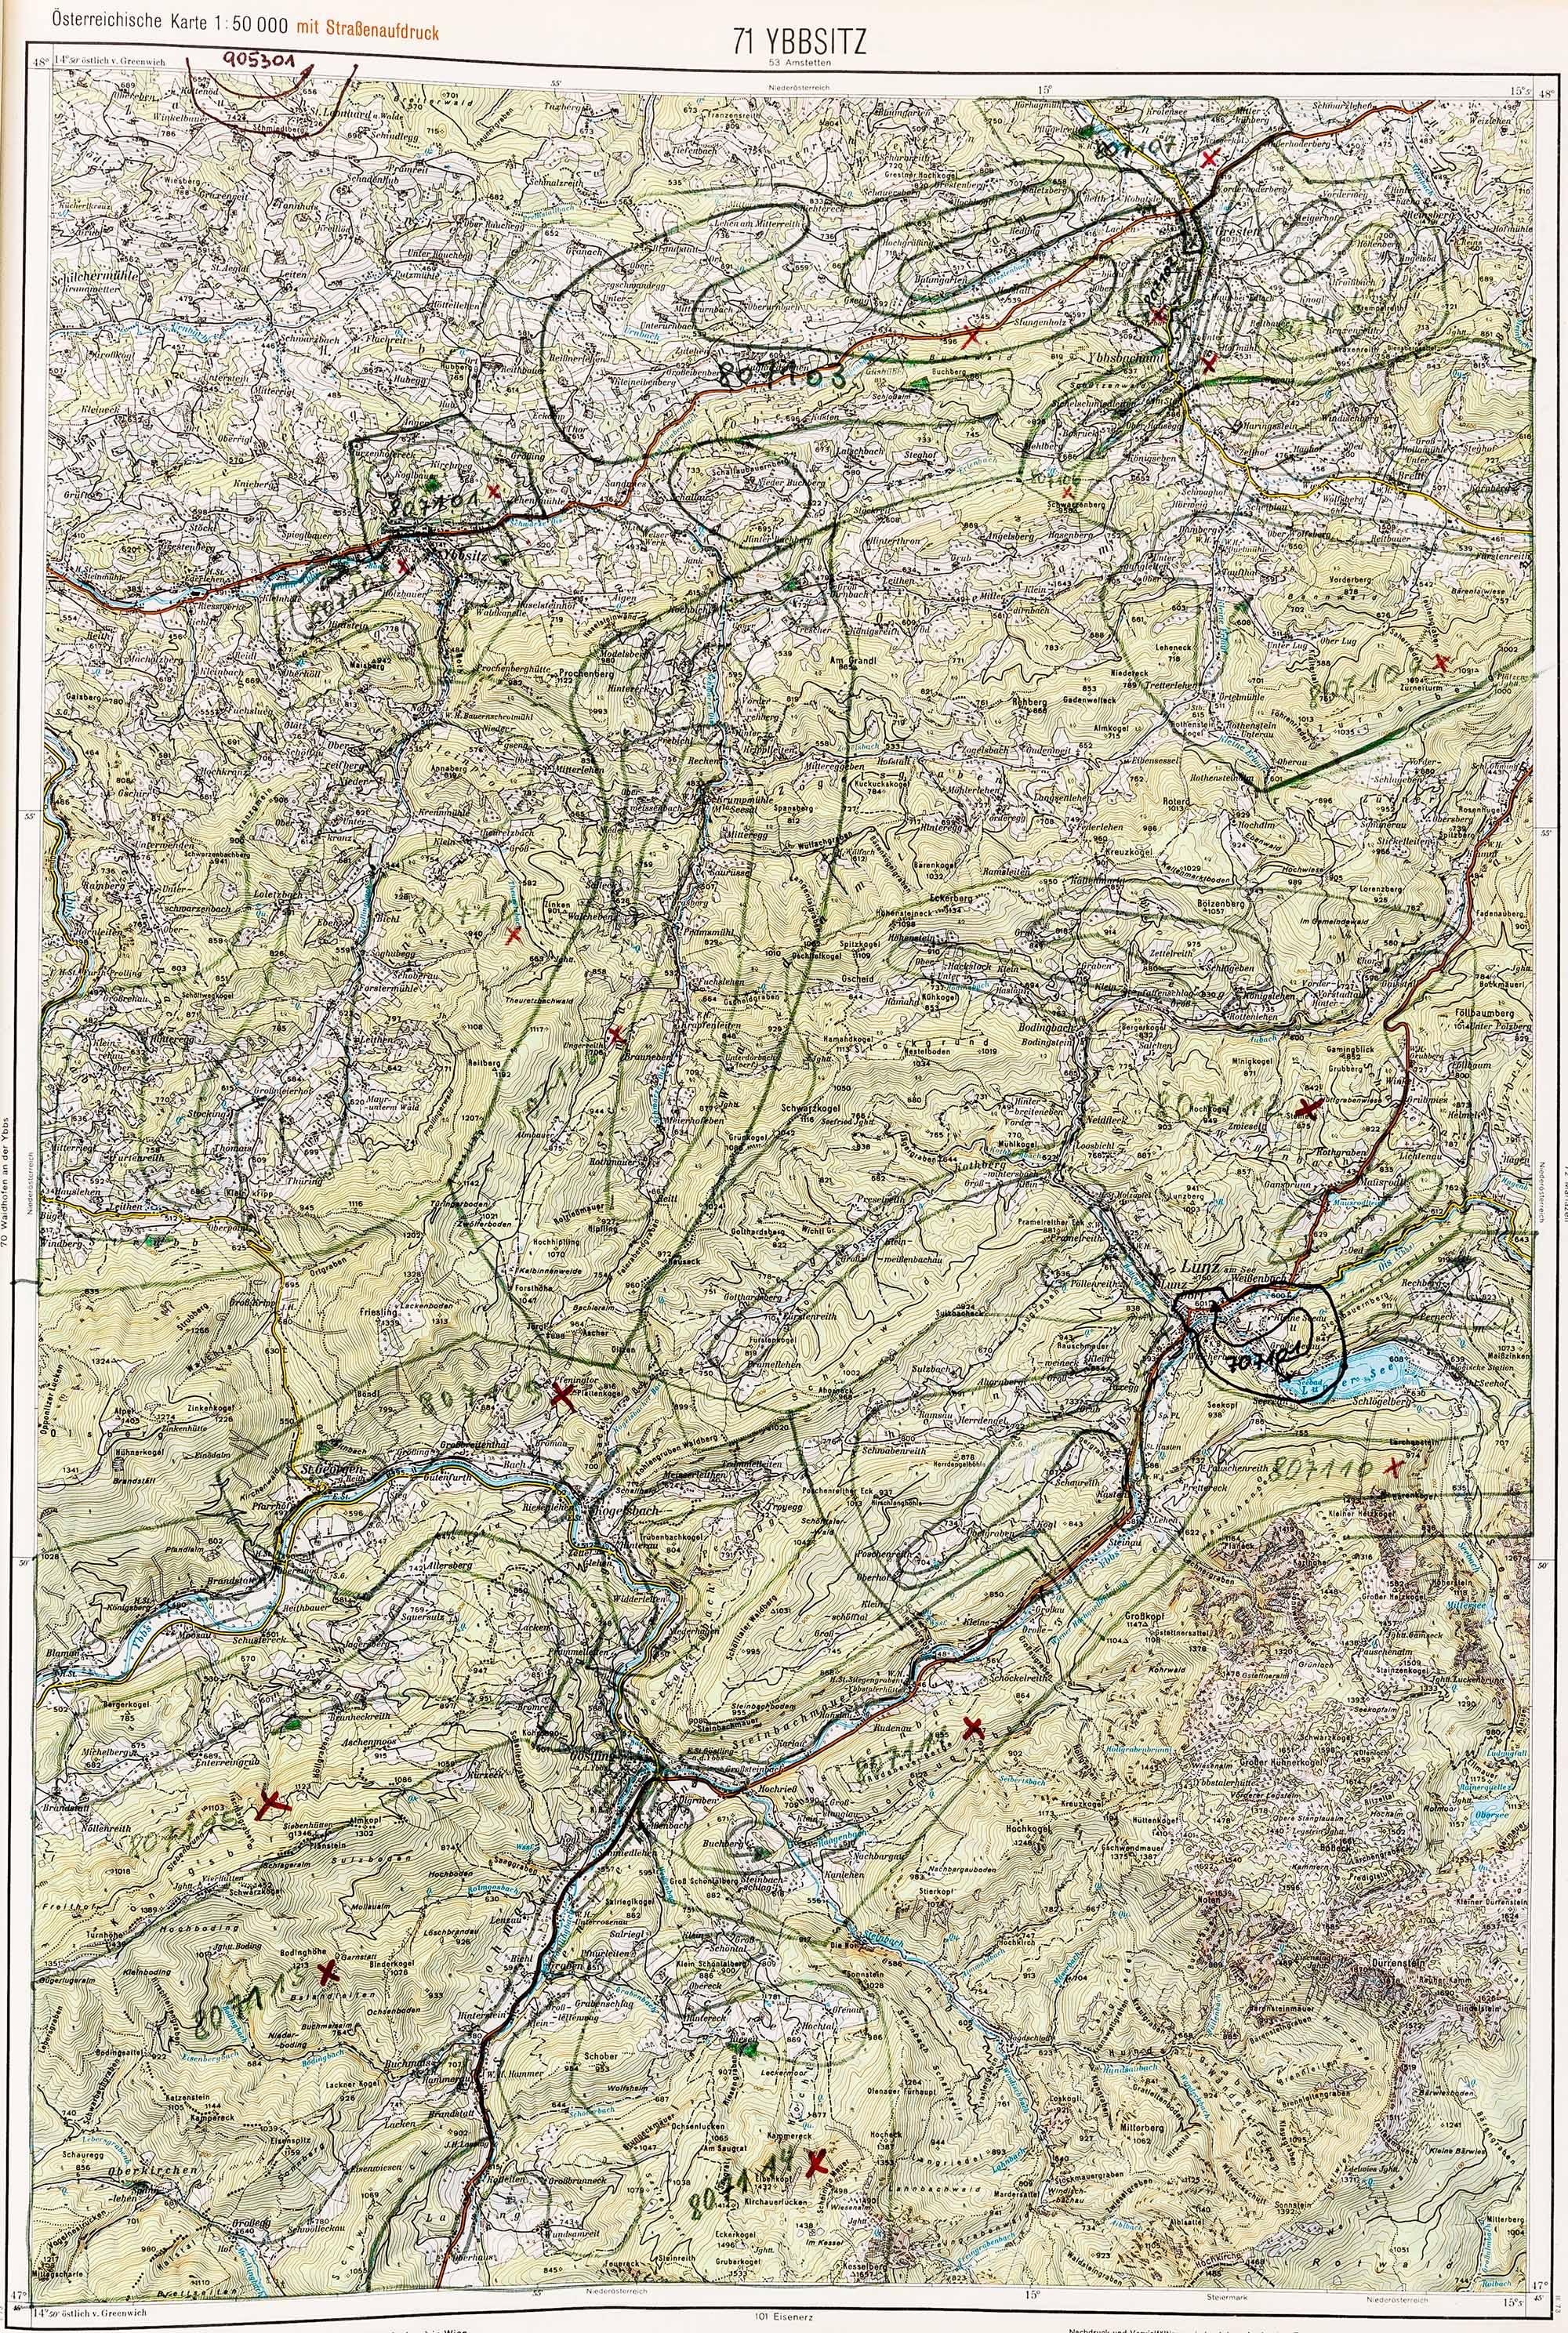 1975-1979 Karte 071